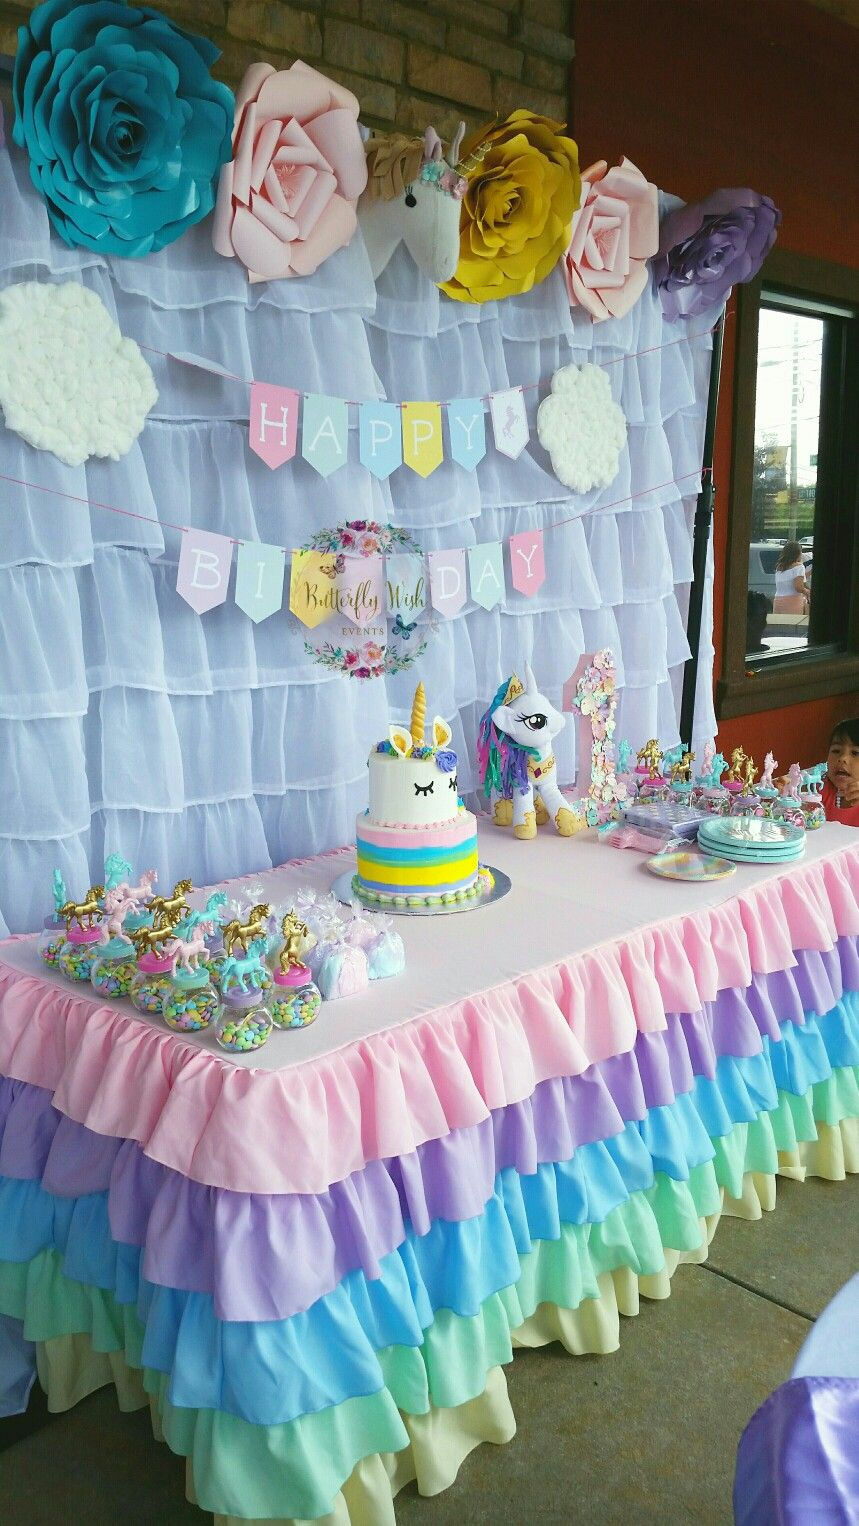 Unicorn birthday party cumple pinterest unicornios globo y unicornio - Decoracion para cumpleanos de 1 ano de varon ...